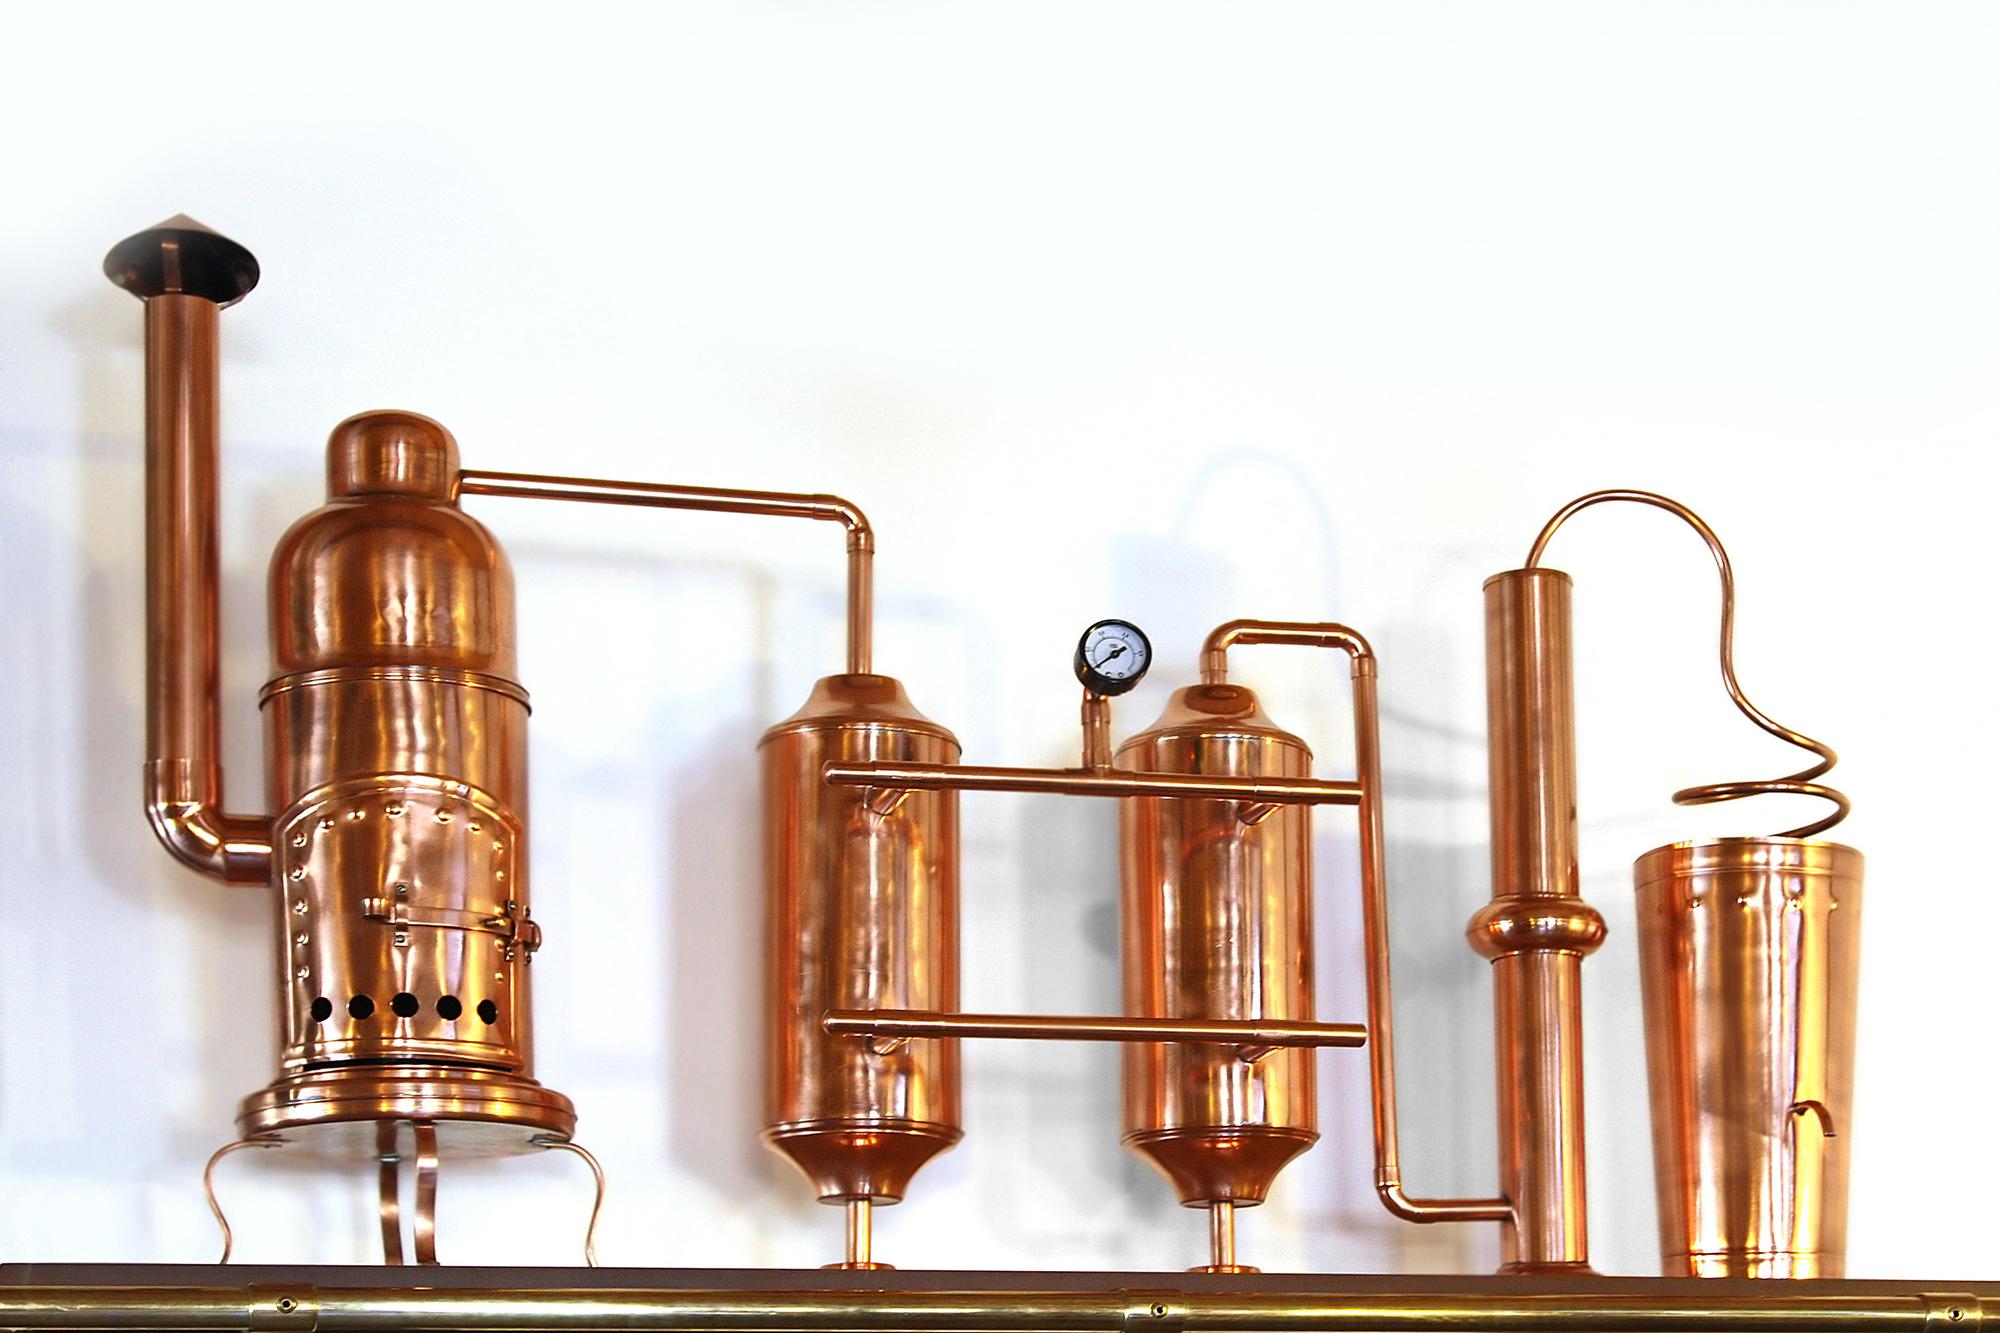 Alembic Copper Still